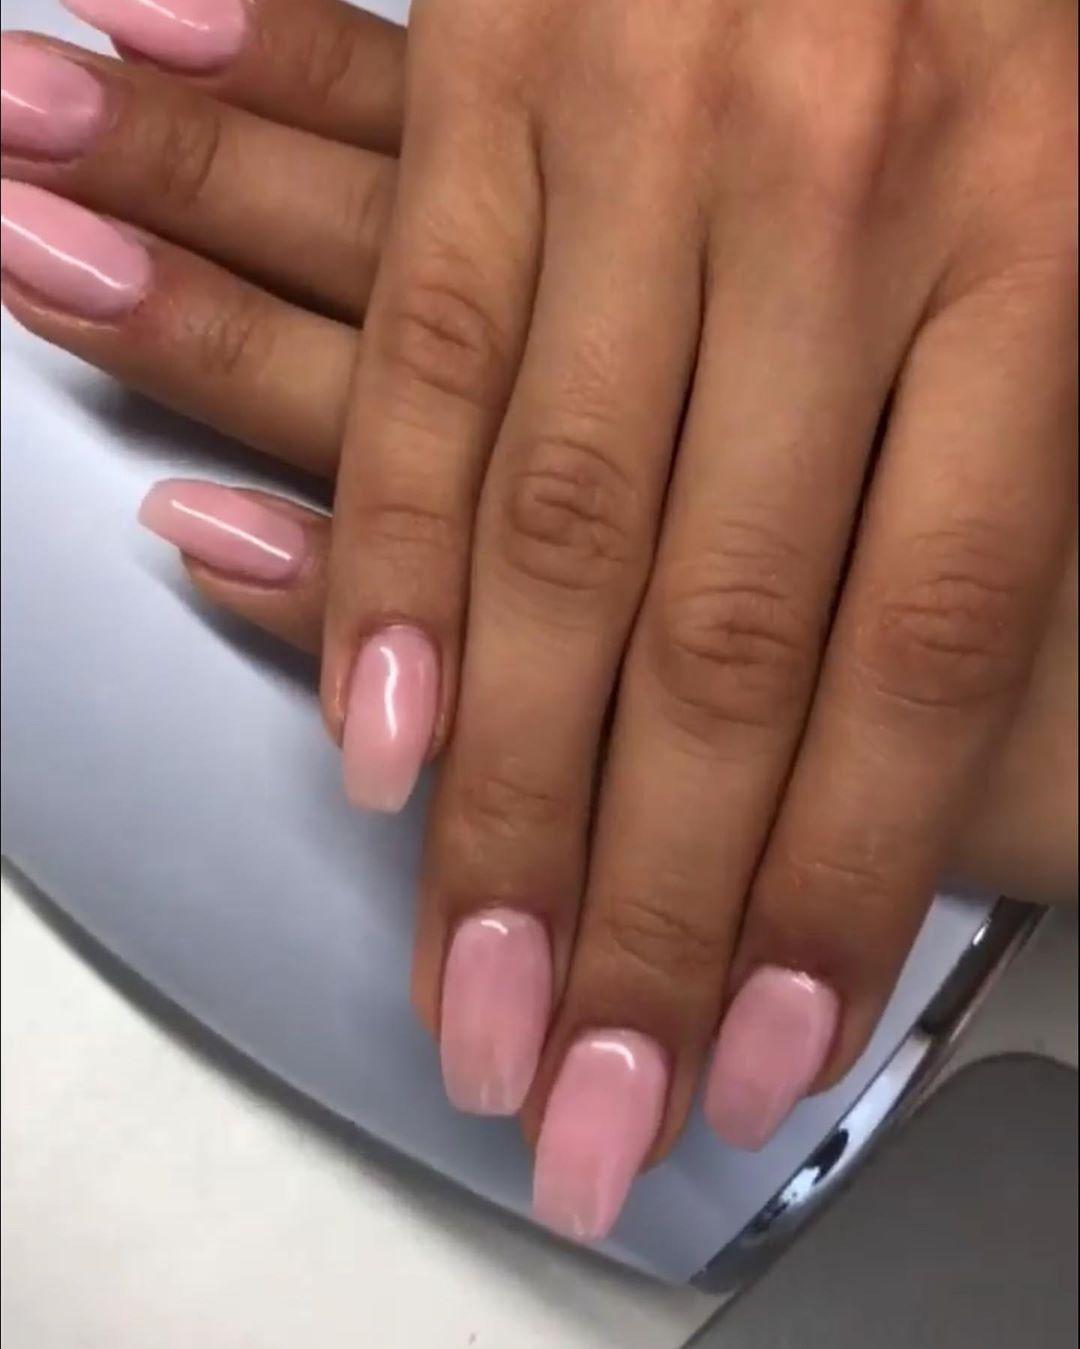 Neuset Nails 90 Statt 120 Stefanialashes Lashes Wimpernlifting Myjob Wimpernverlangerung Wimpern Stefanianails Nails Nail Gell G In 2020 Nails Nail Tips